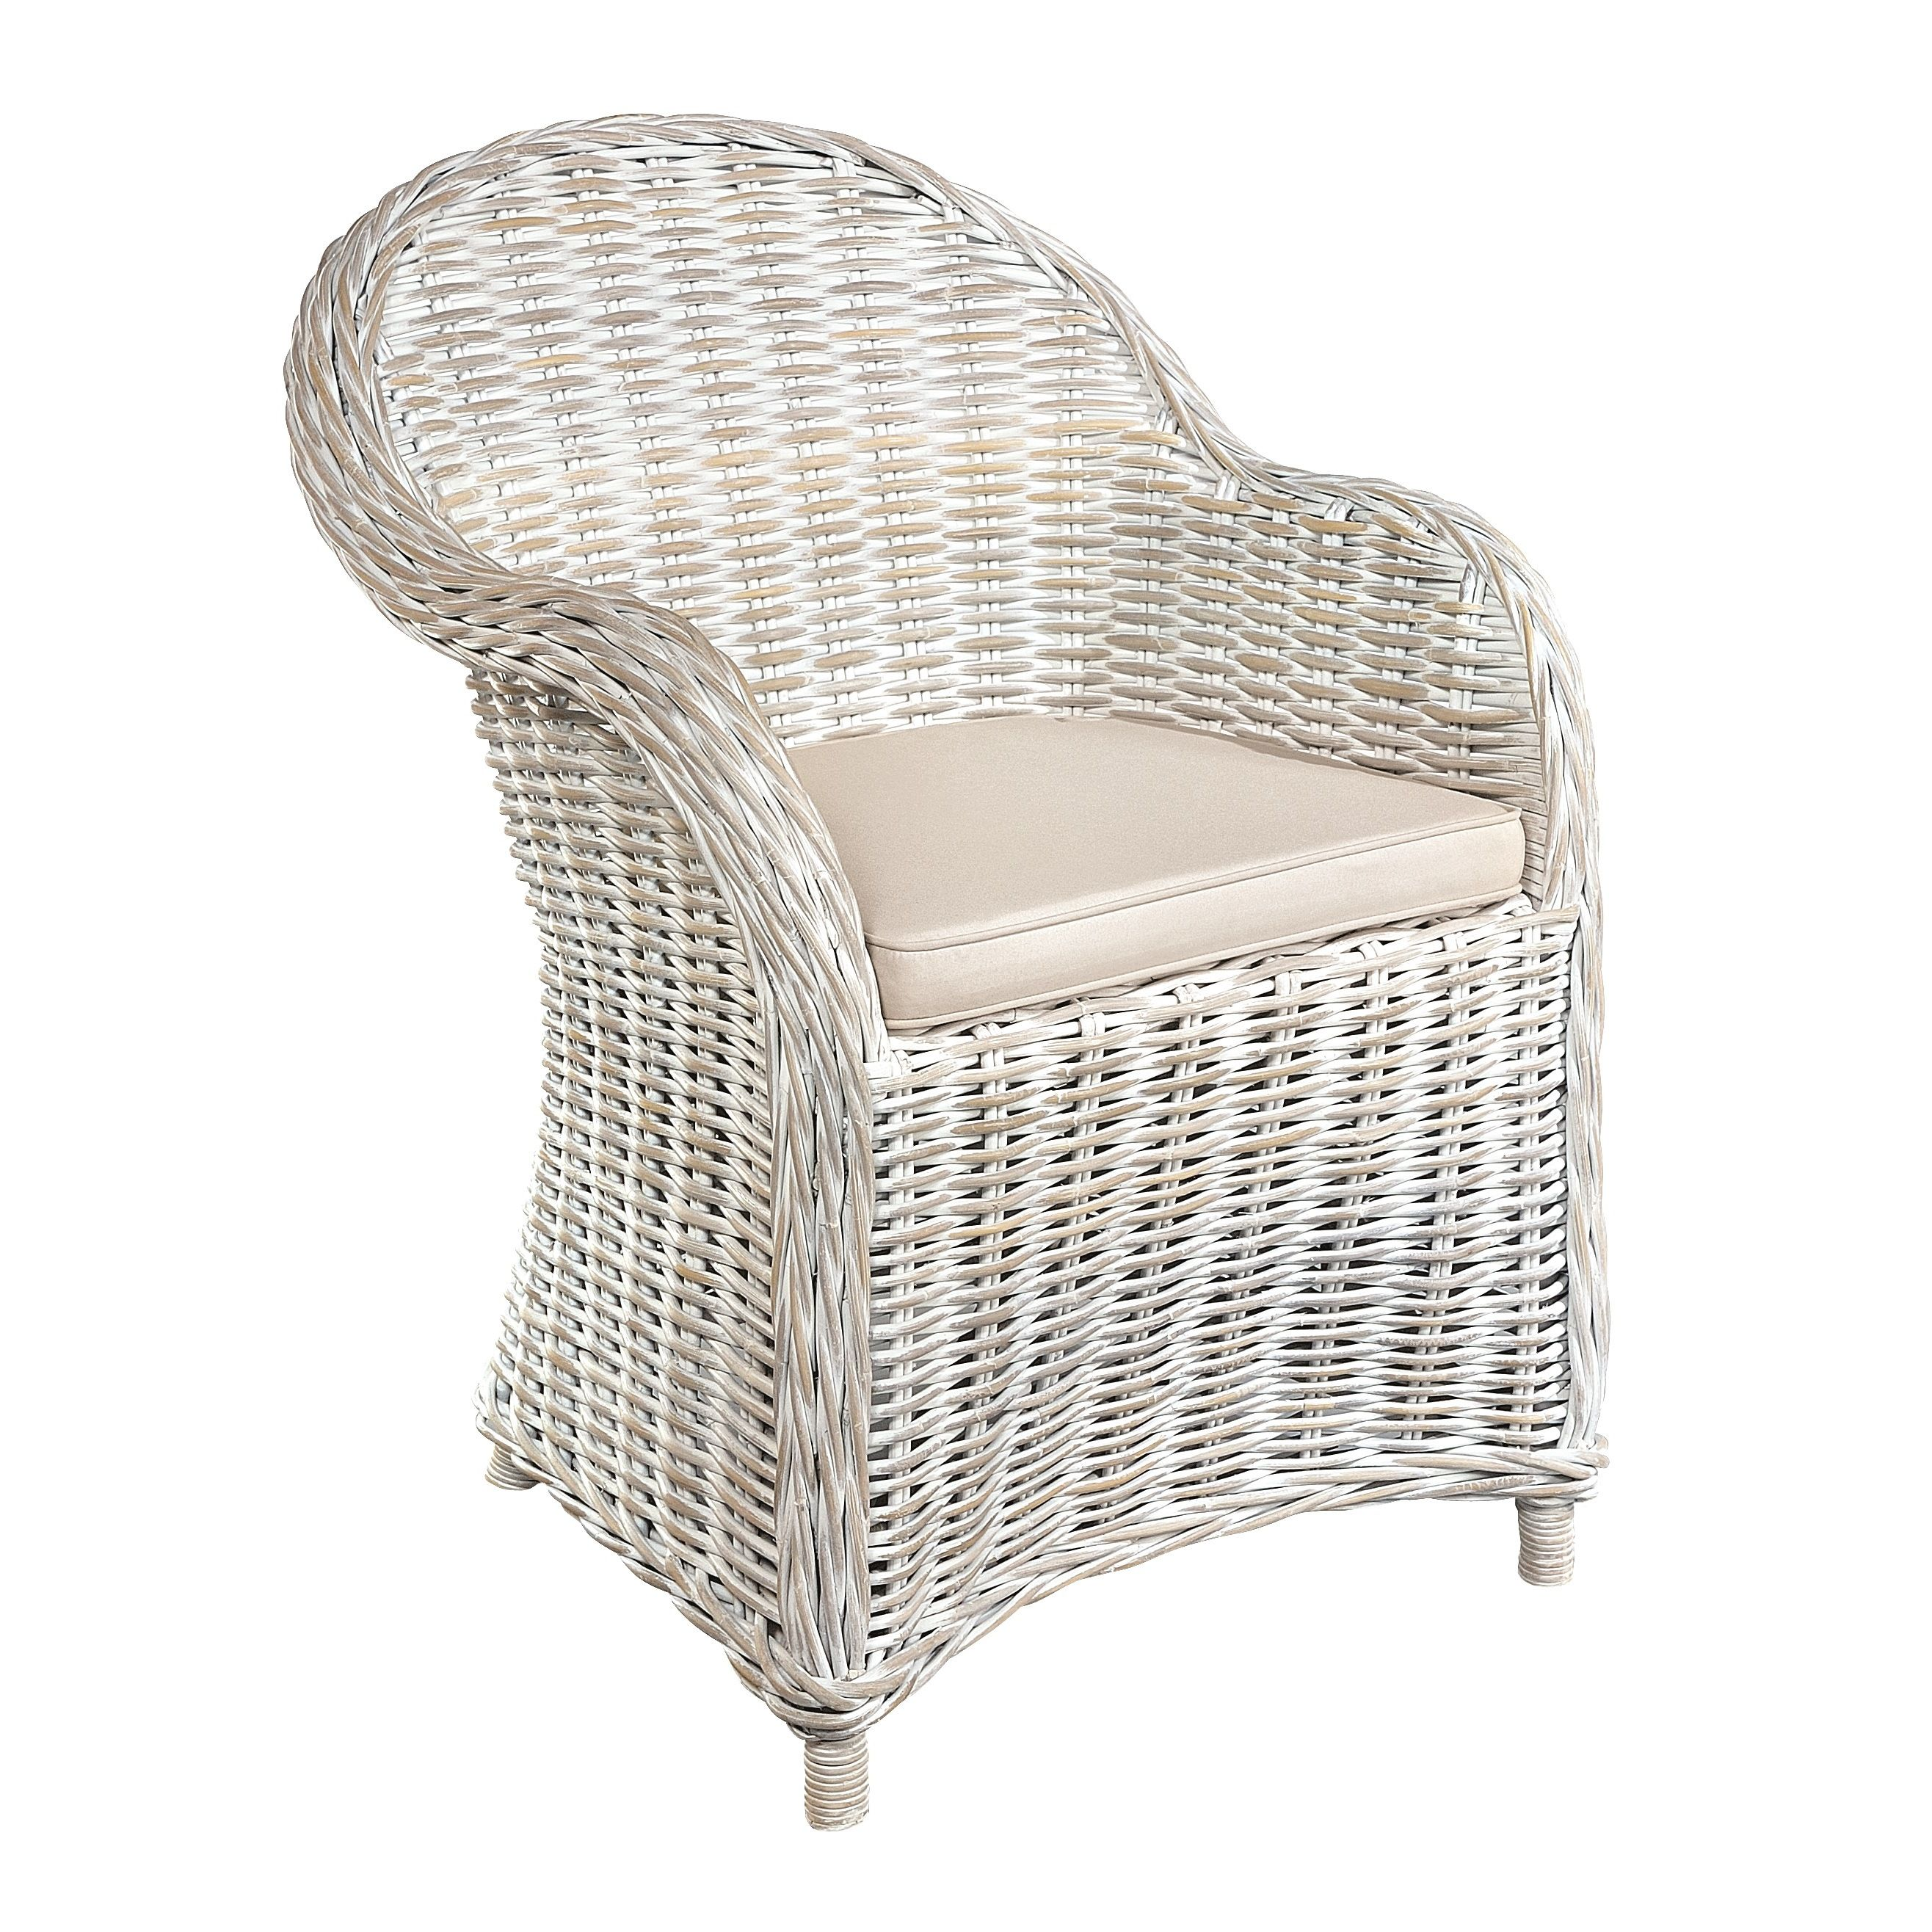 Furniture Country White Arm Chair Rattan Chair. Riley Blue